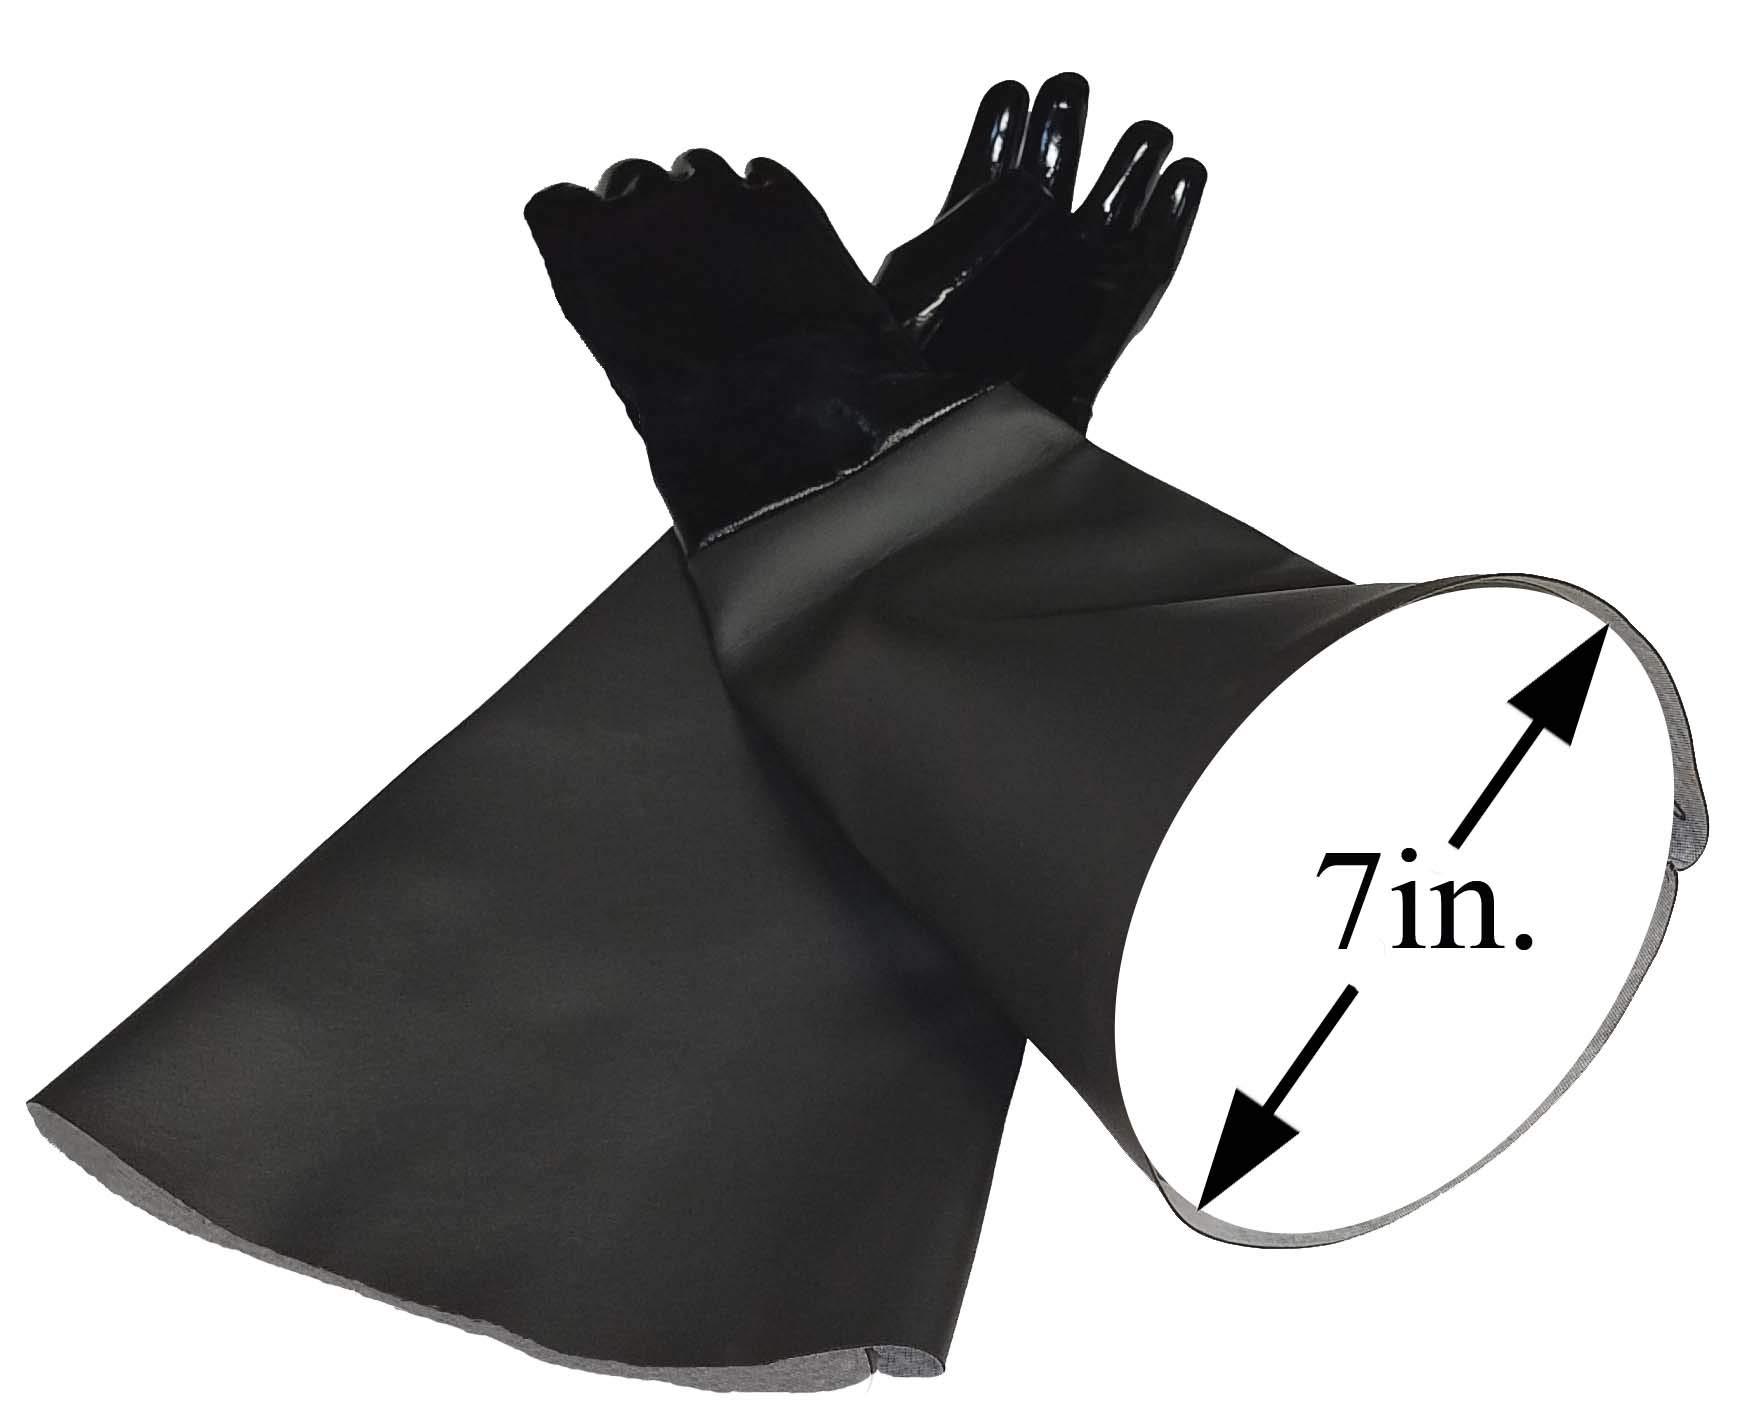 TUFF-Blast Neoprene Gloves for Sandblasting Sandblaster Sand Blast Cabinet - 7'' x 26'' Made in USA by TUFF-Blast